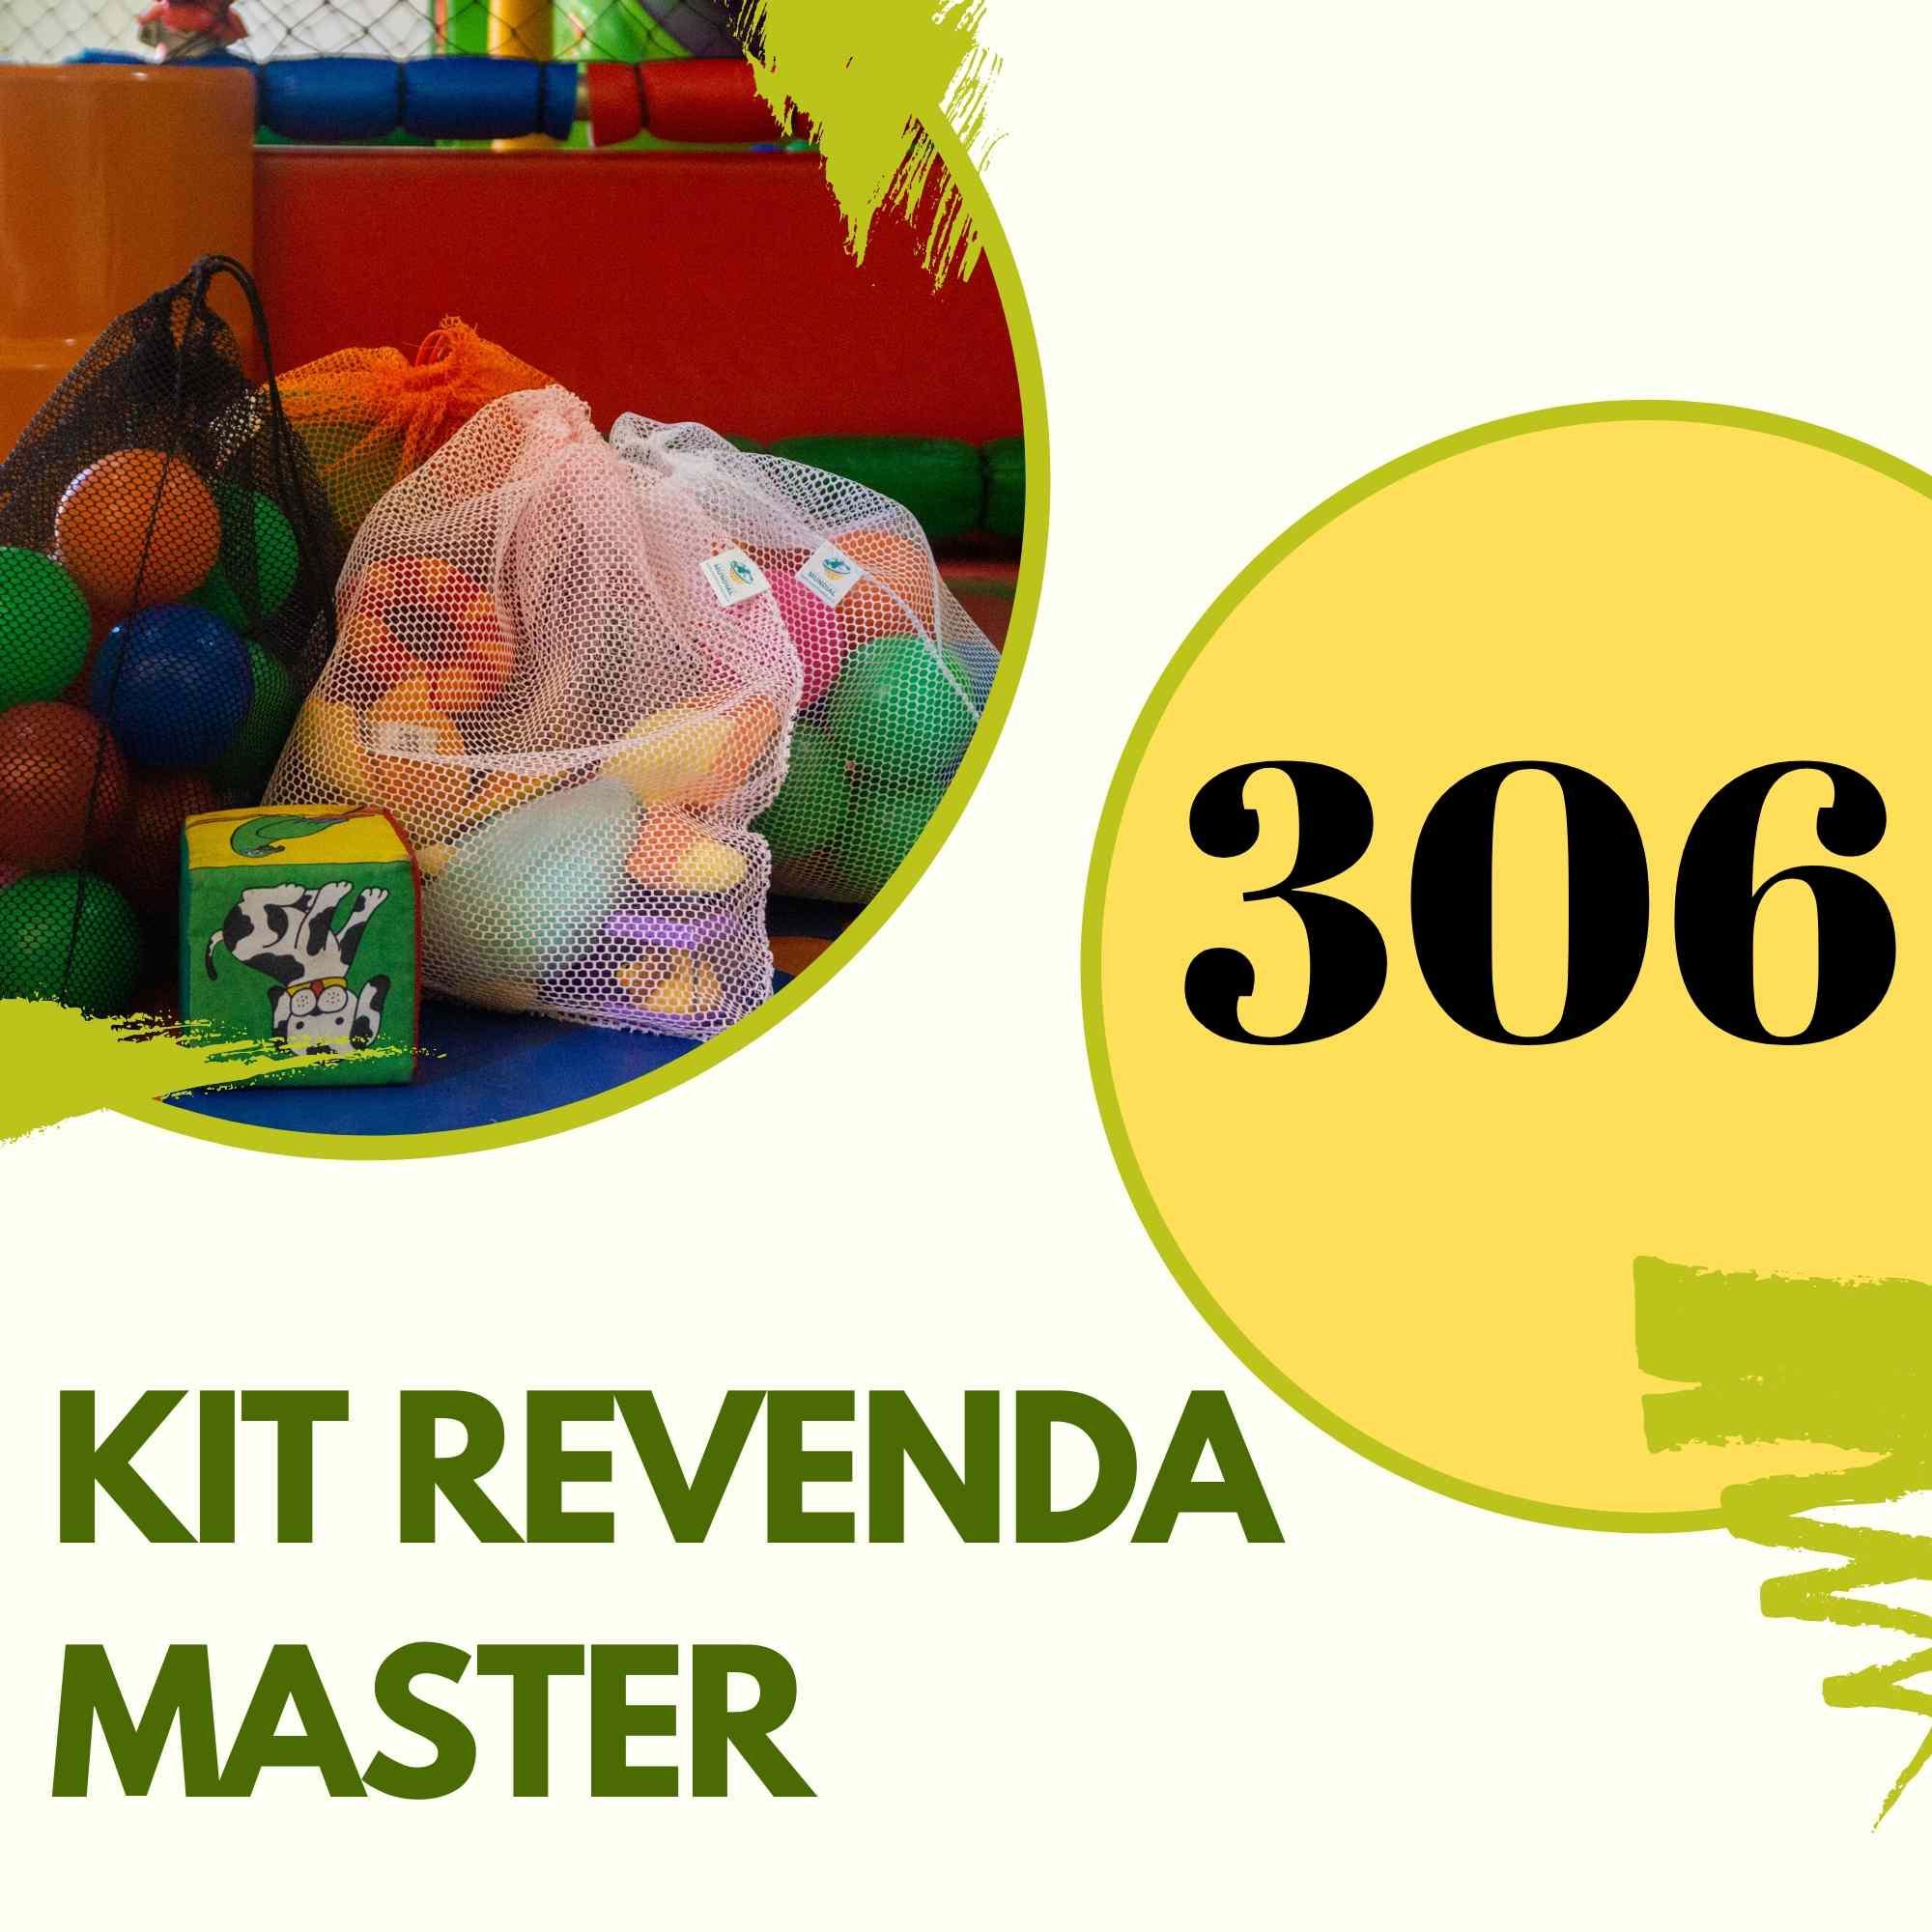 KIT REVENDA MASTER 306 saquinhos